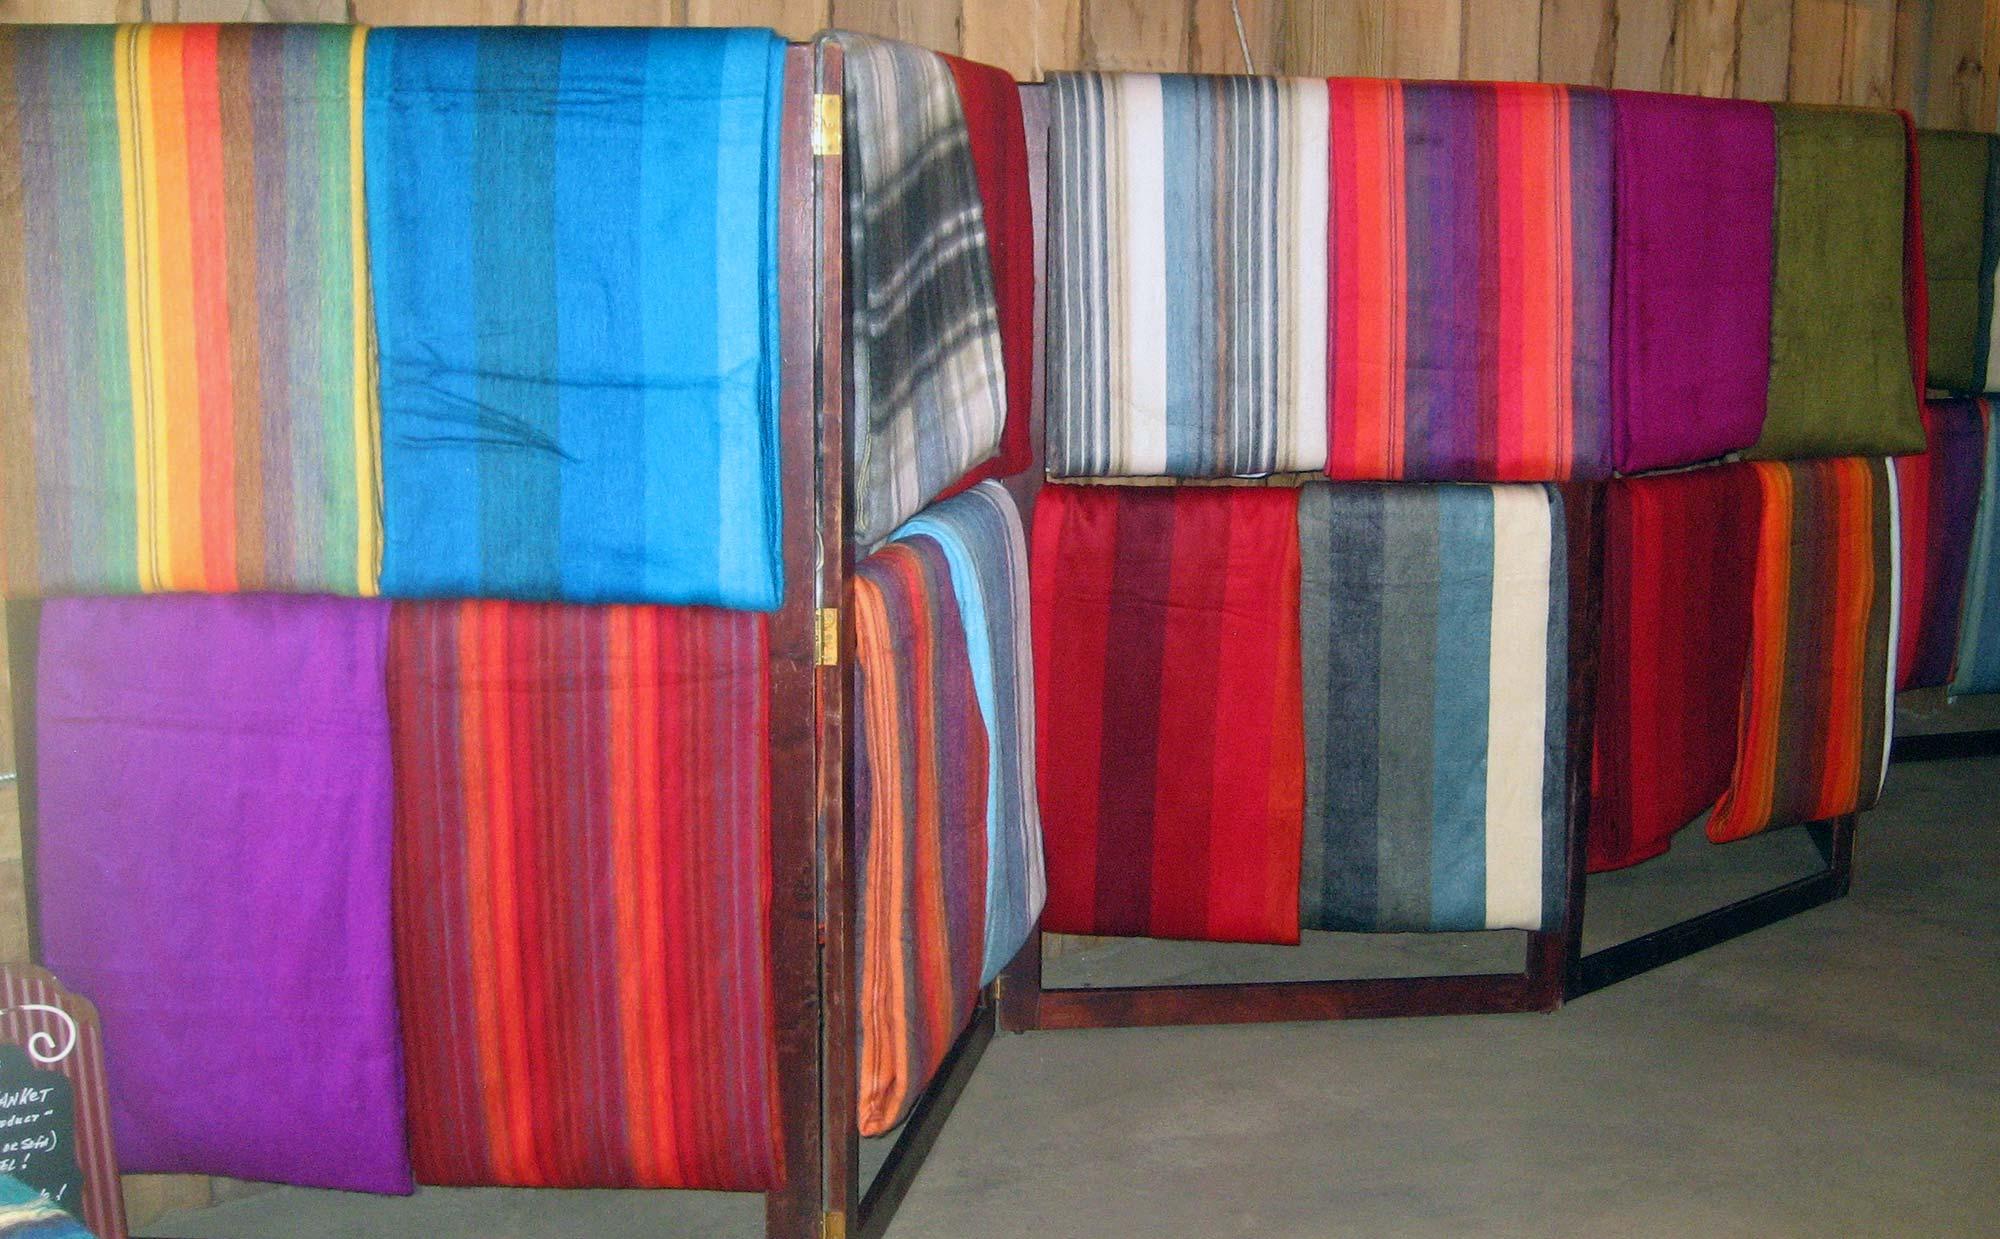 Alpaca blankets display